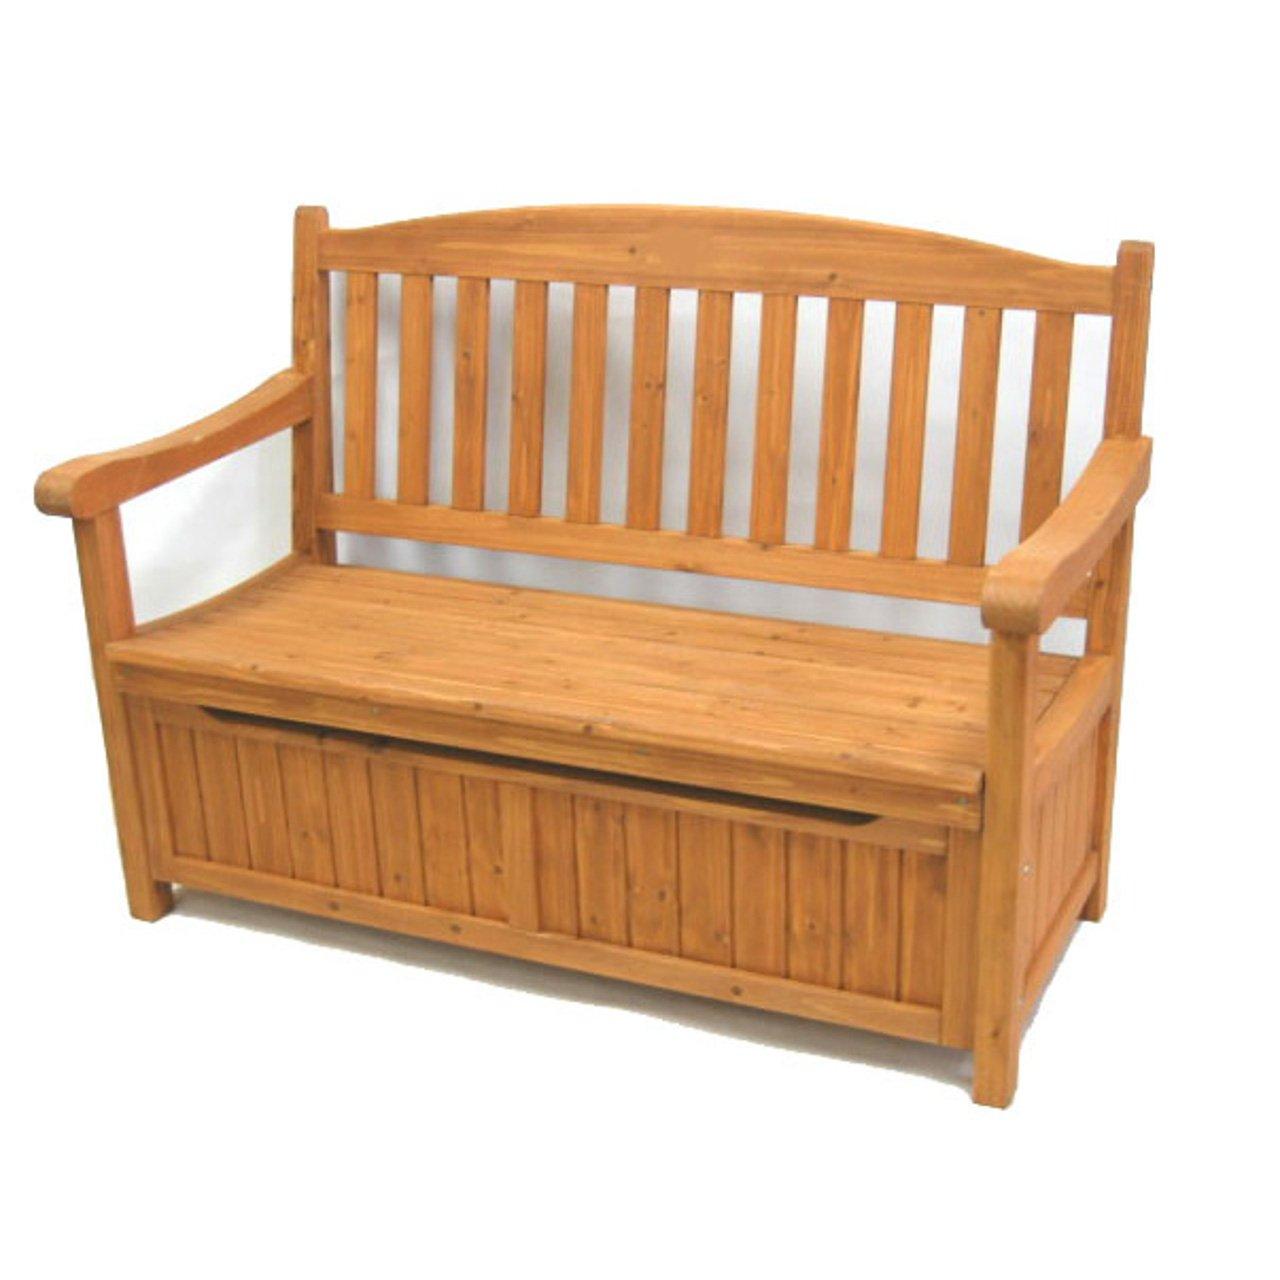 AHEART ガーデンベンチ 収納 屋外 収納庫 付き 木製 ストッカー 物置 庭 テラス SI 426 ブラウン B07F683PHJ  ブラウン